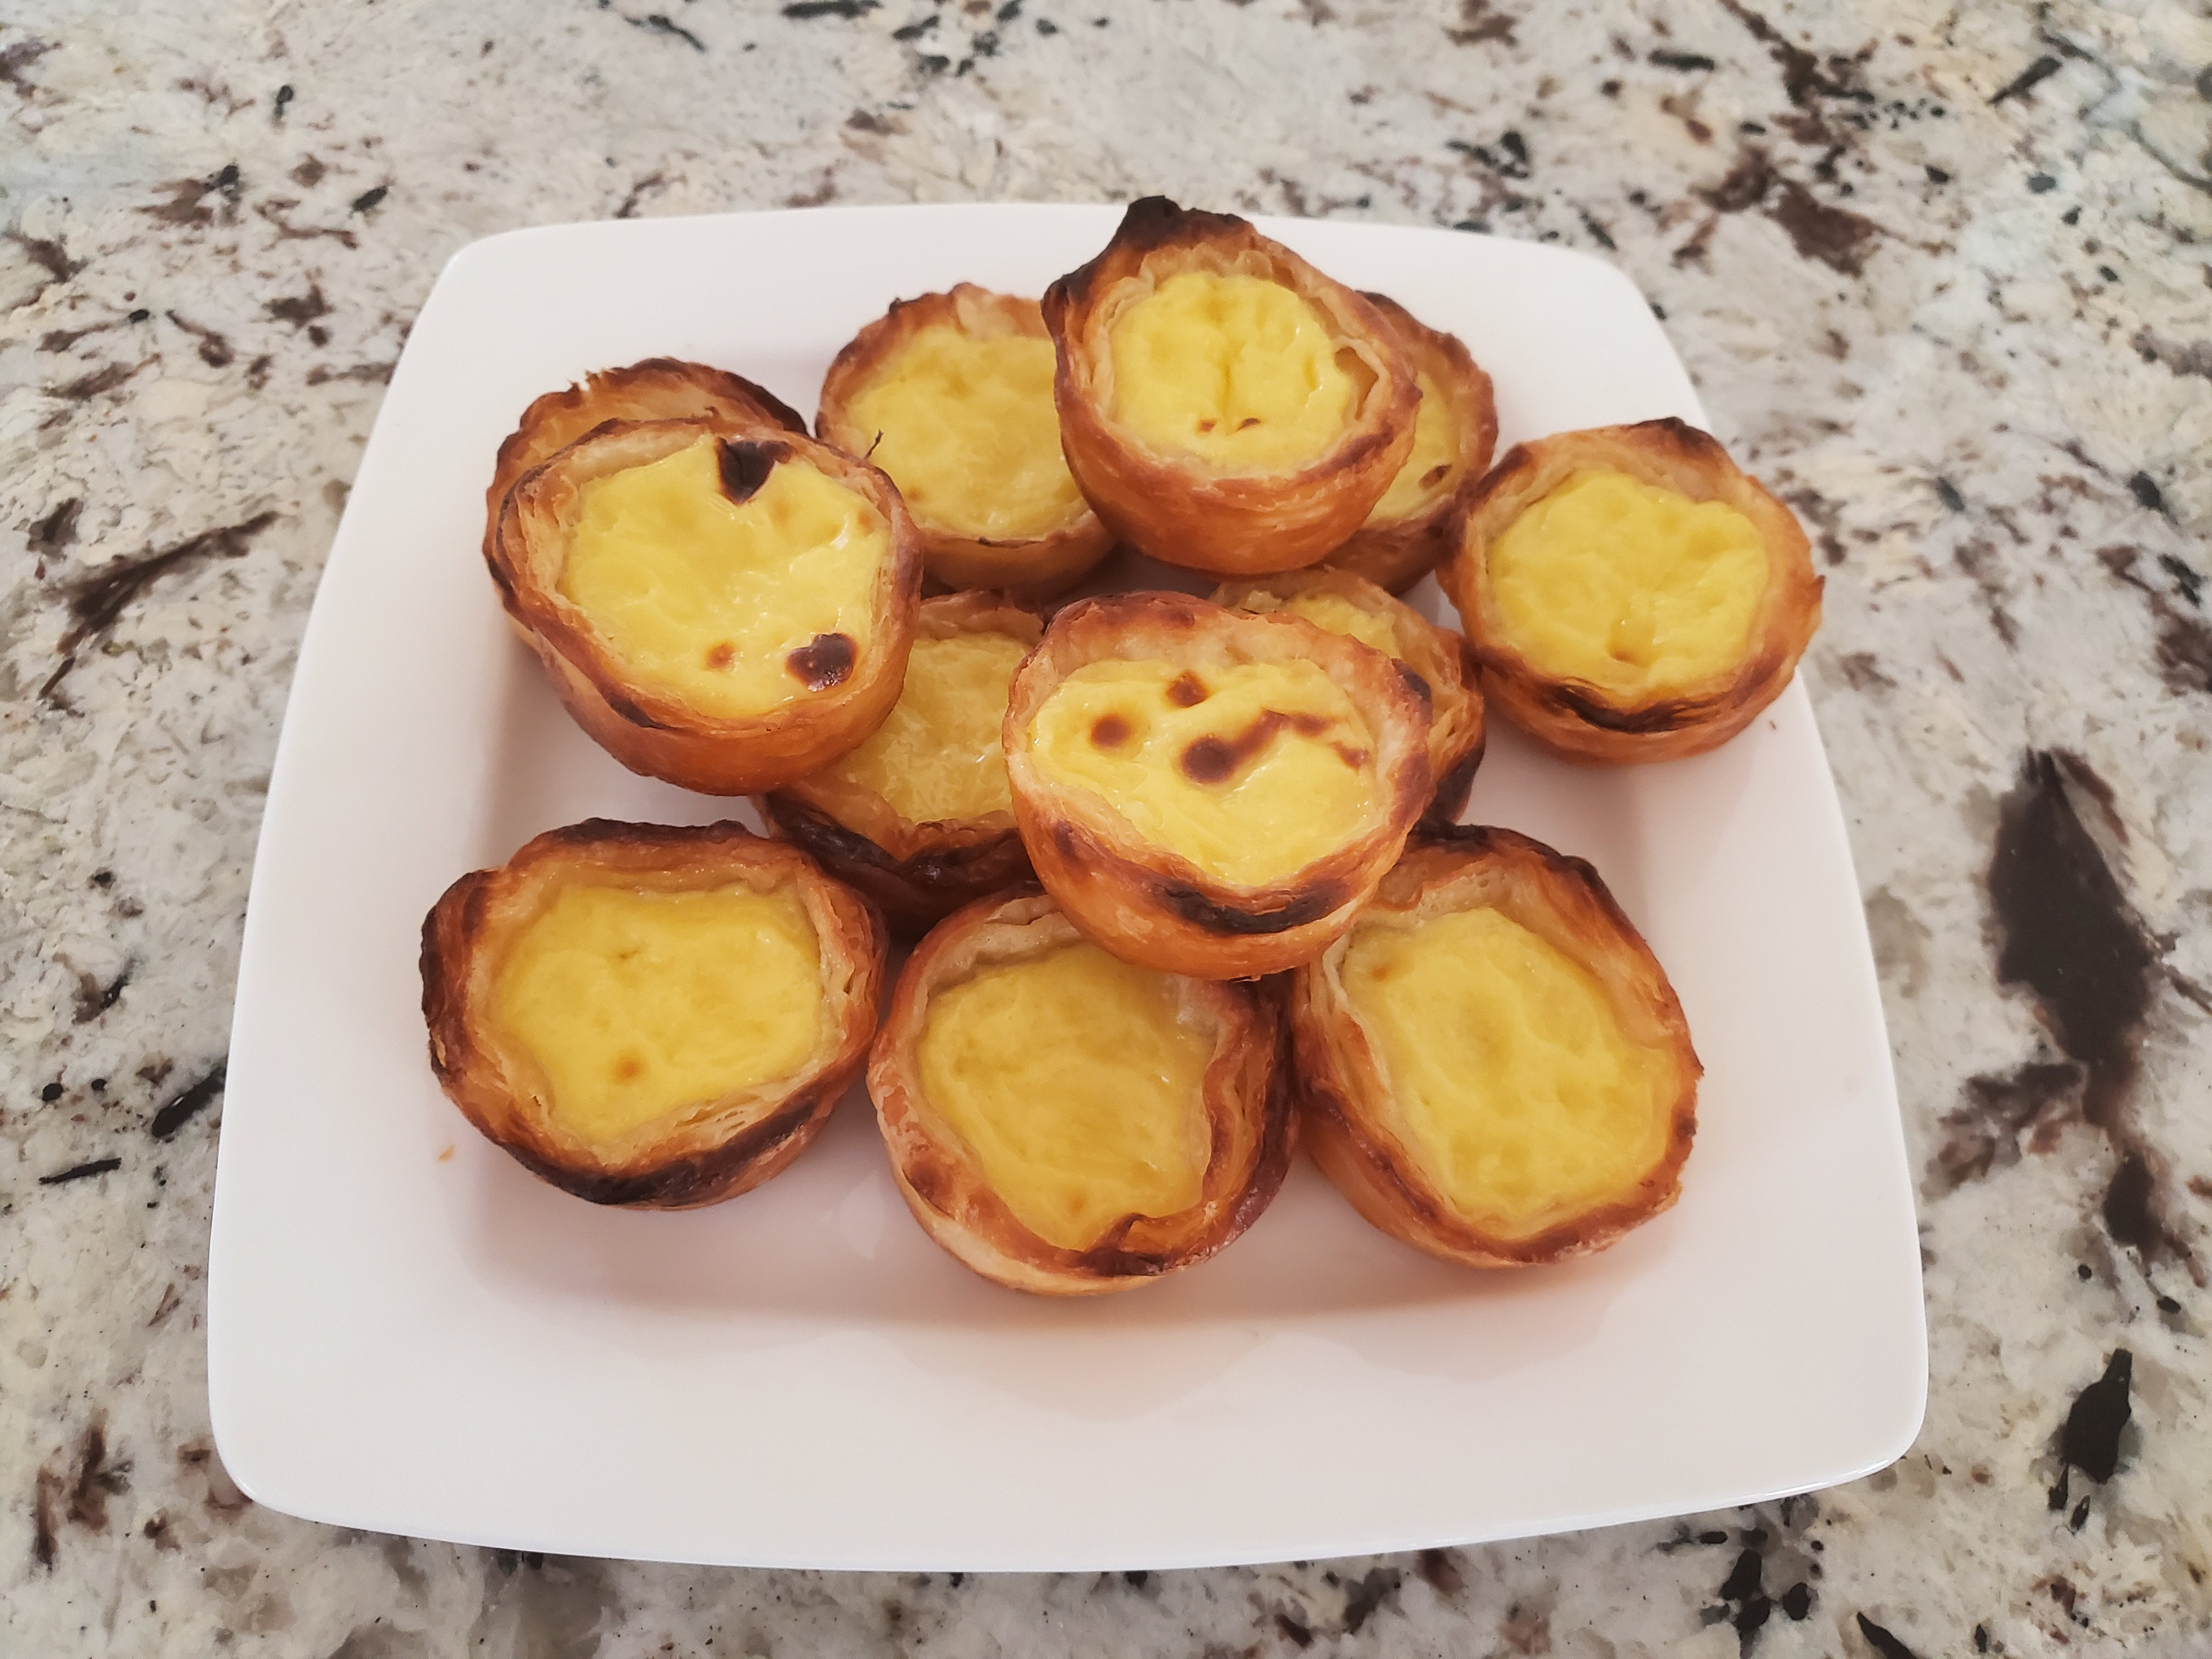 Portuguese Custard Tarts (Pasteis de Nata) Ashley Marie